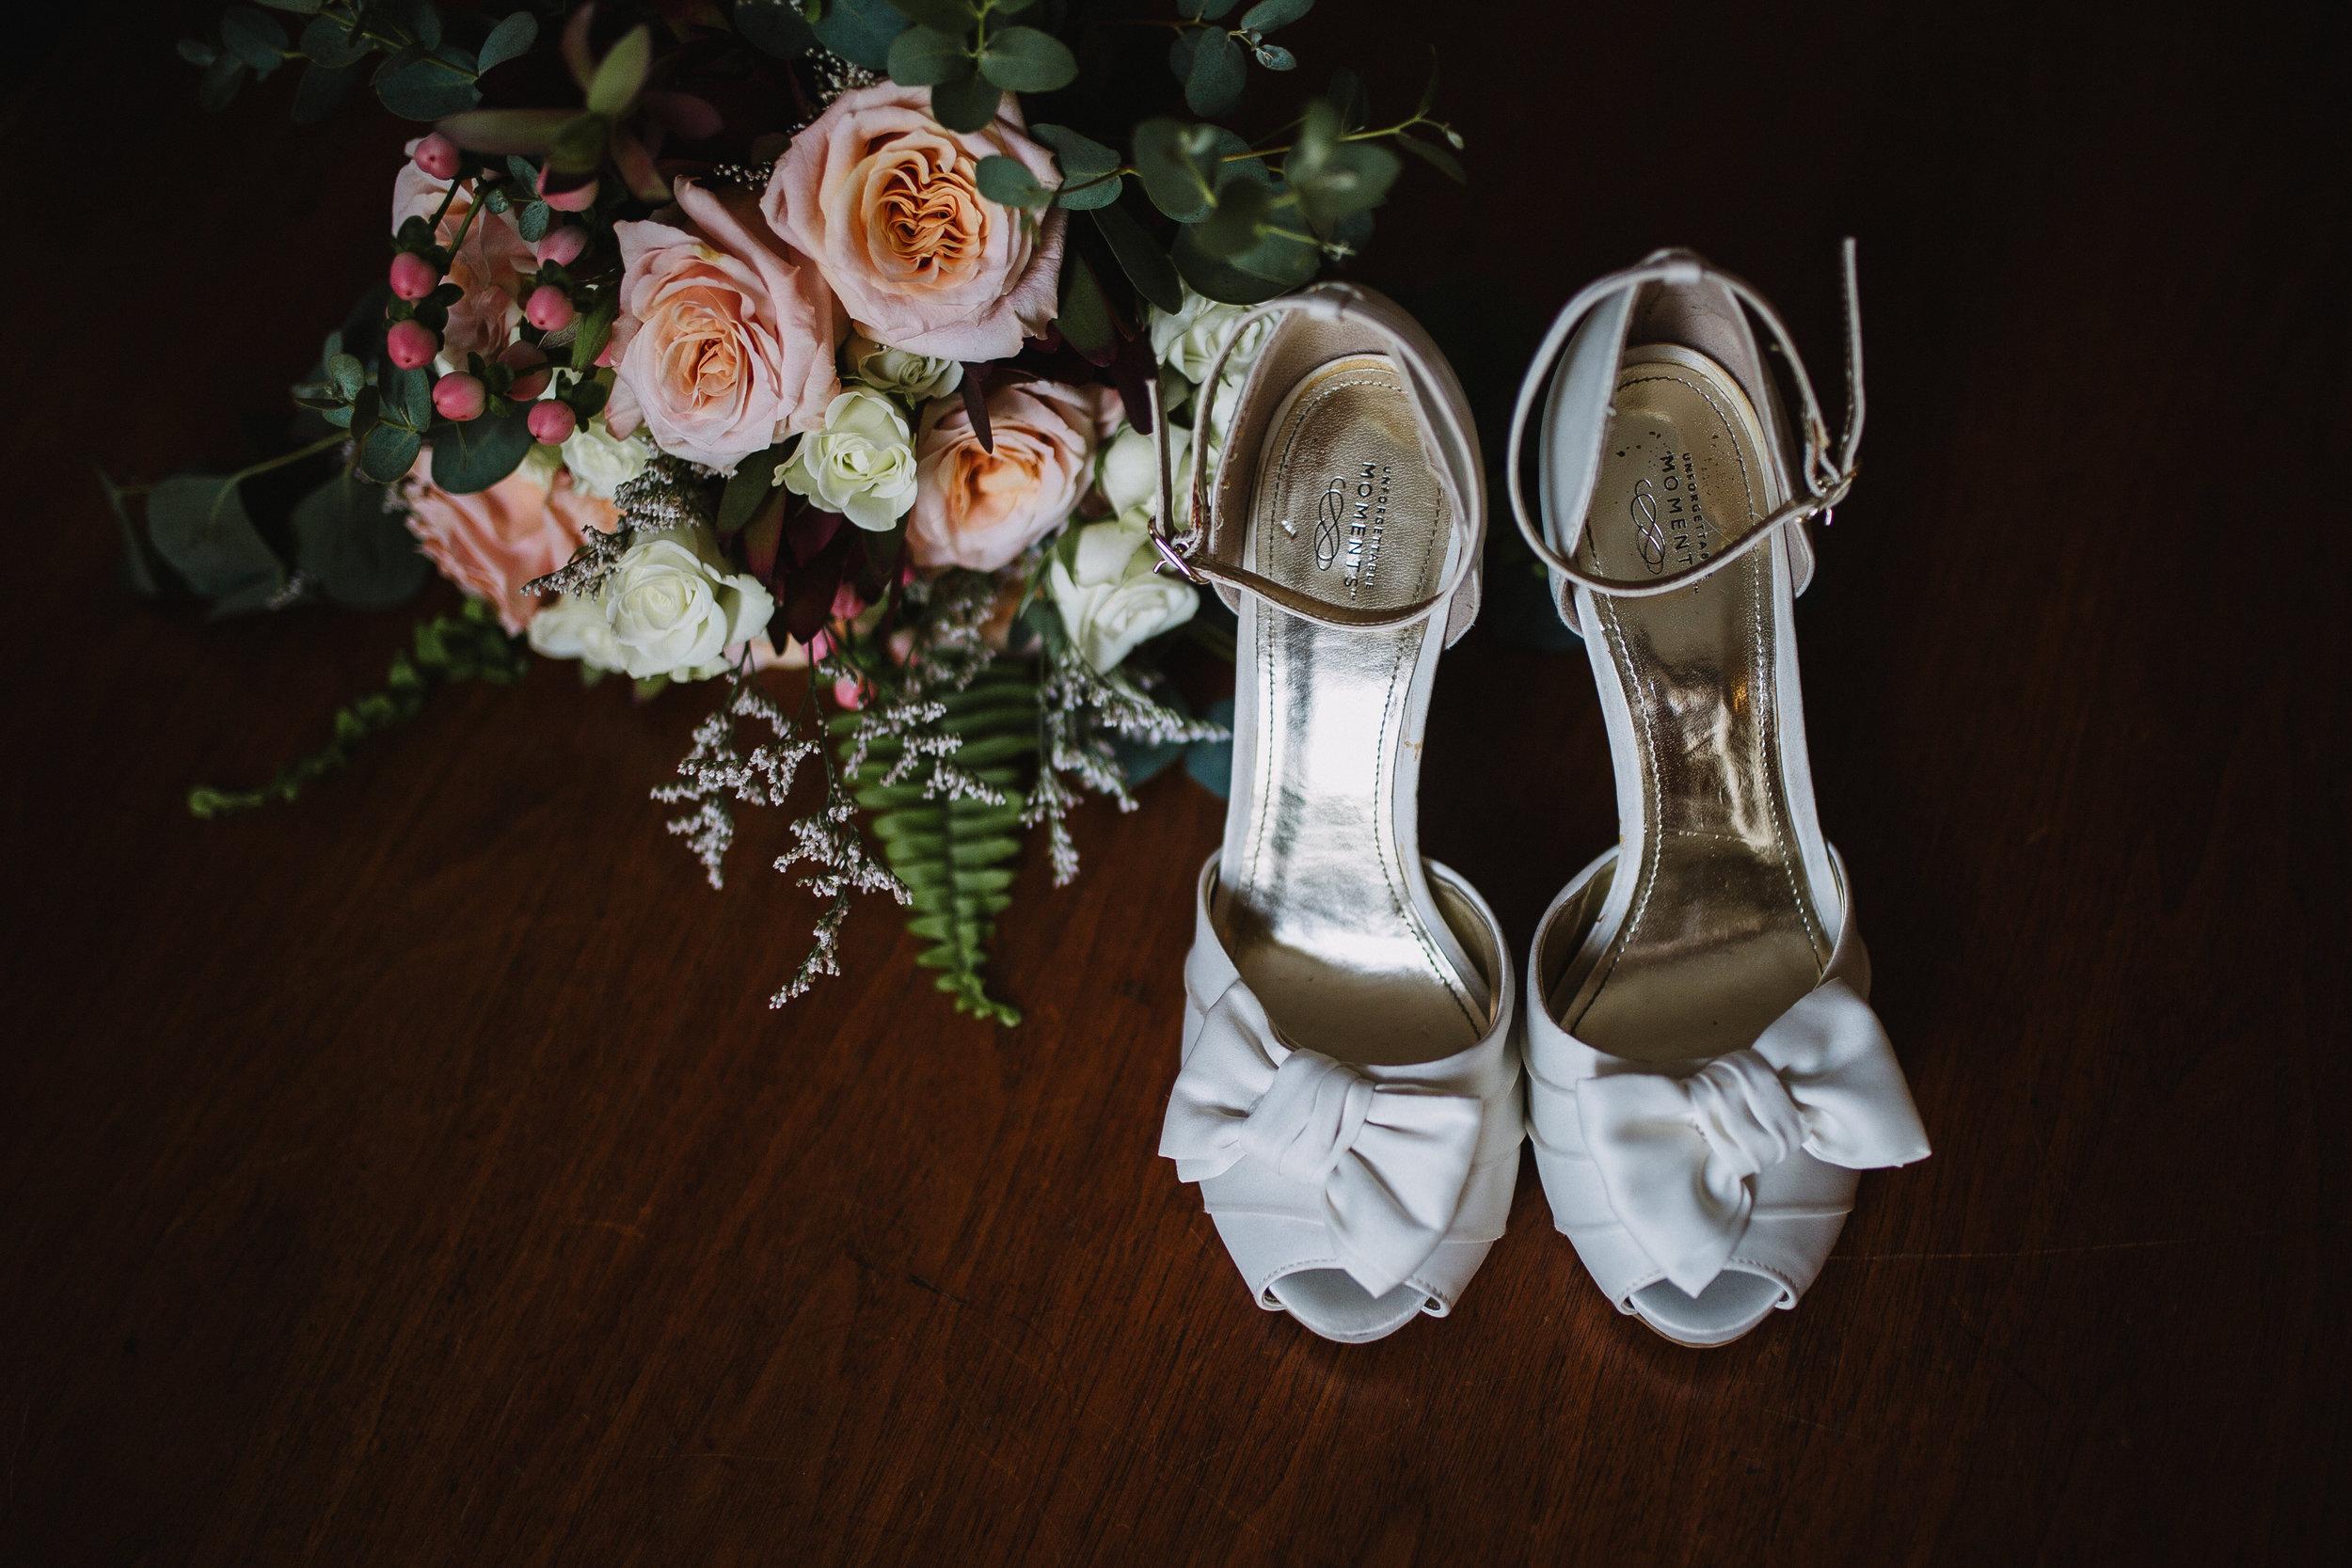 TRADITIONAL-WEDDING-PATTERNMAGAZINE-REAGANLYNNPHOTOGRAPHY-INDIANAPOLIS-INDIANA-1.jpg